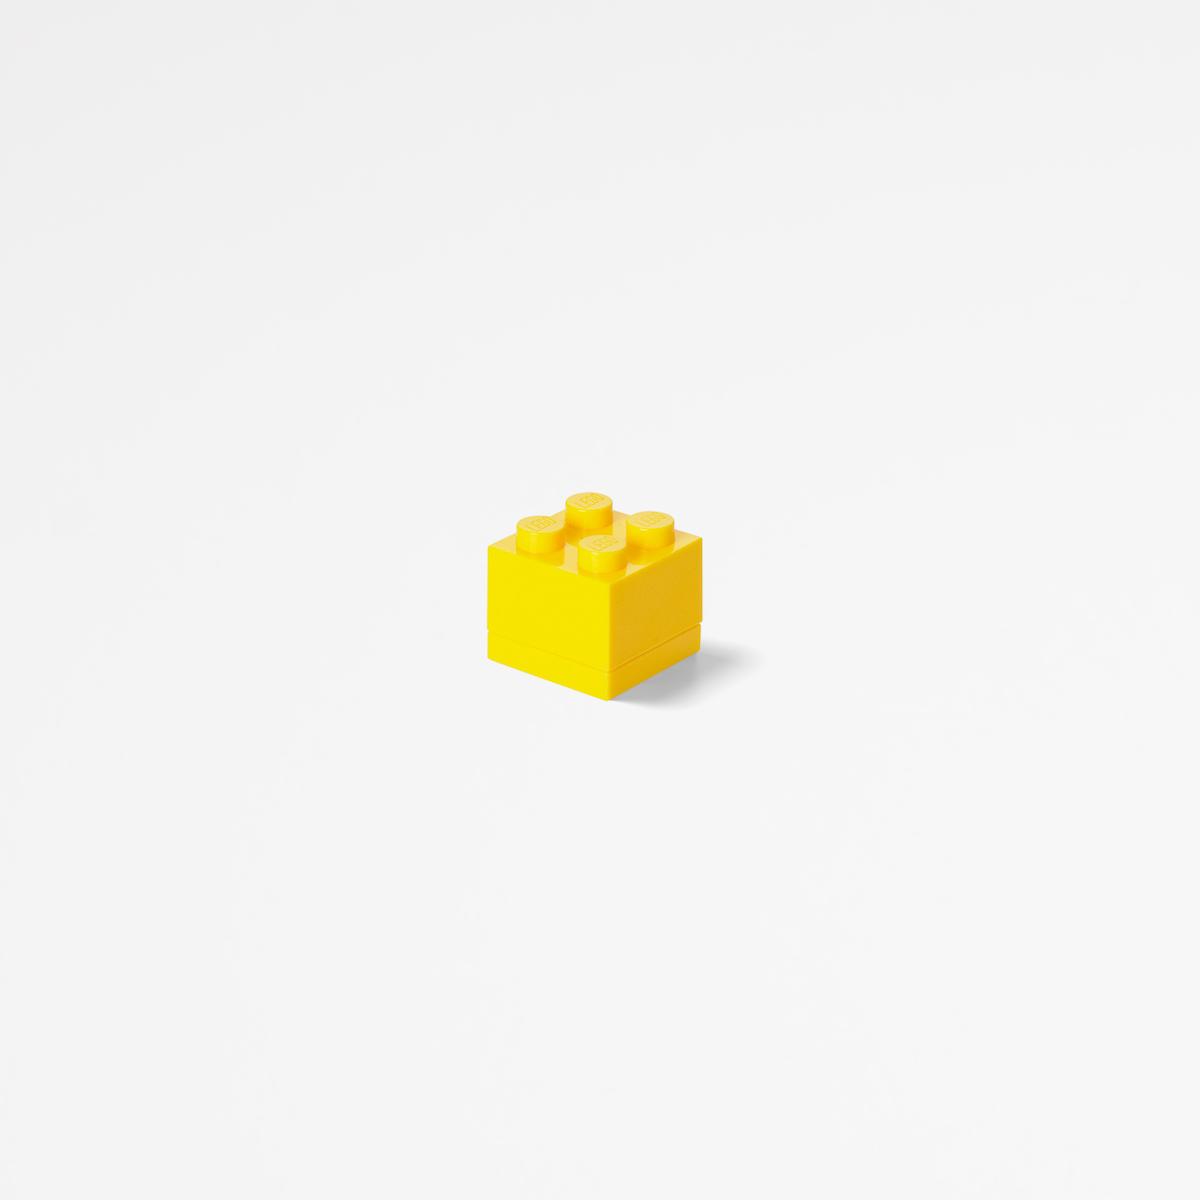 Lego mini box4, plastic, small, food, healthy, kids, yellow